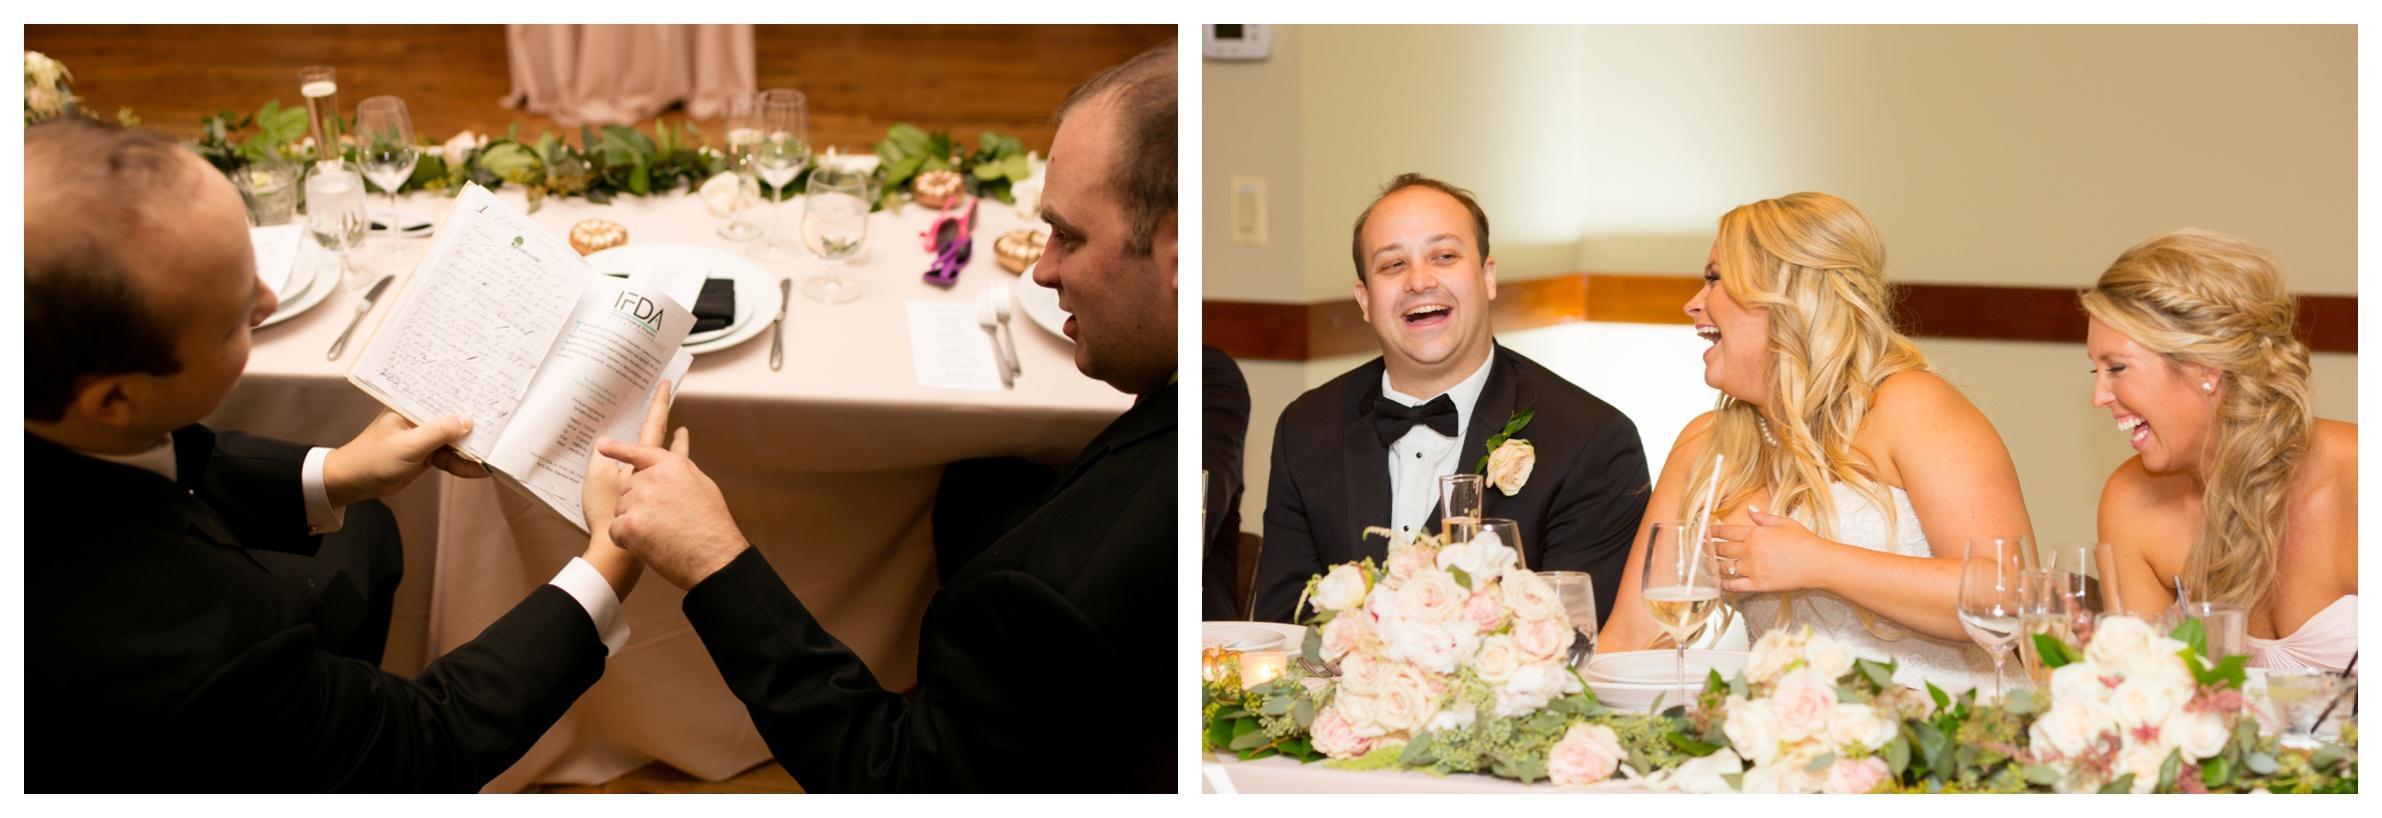 pinstripes-wedding-photo-59.jpg